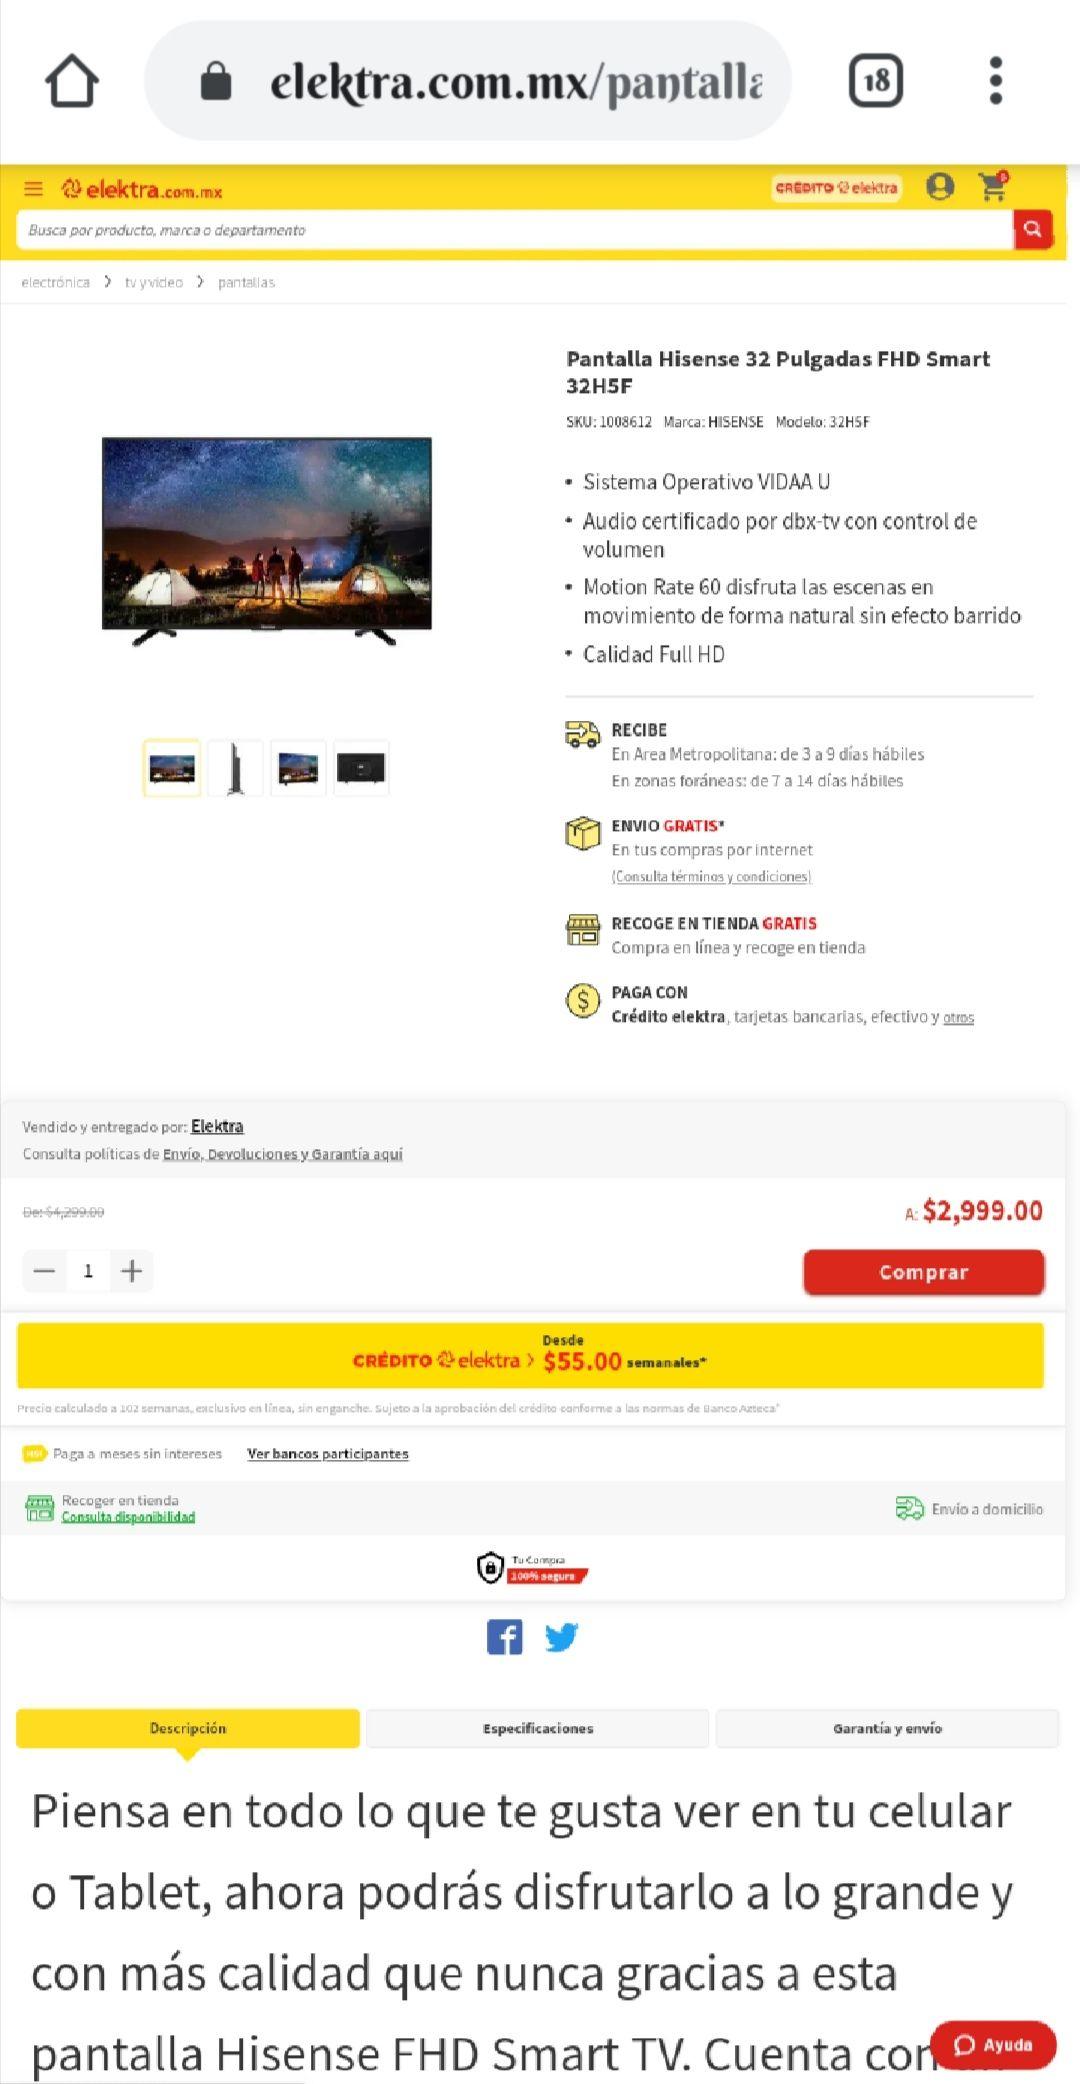 Elektra: Smart TV Pantalla Hisense 32 Pulgadas FHD Smart 32H5F